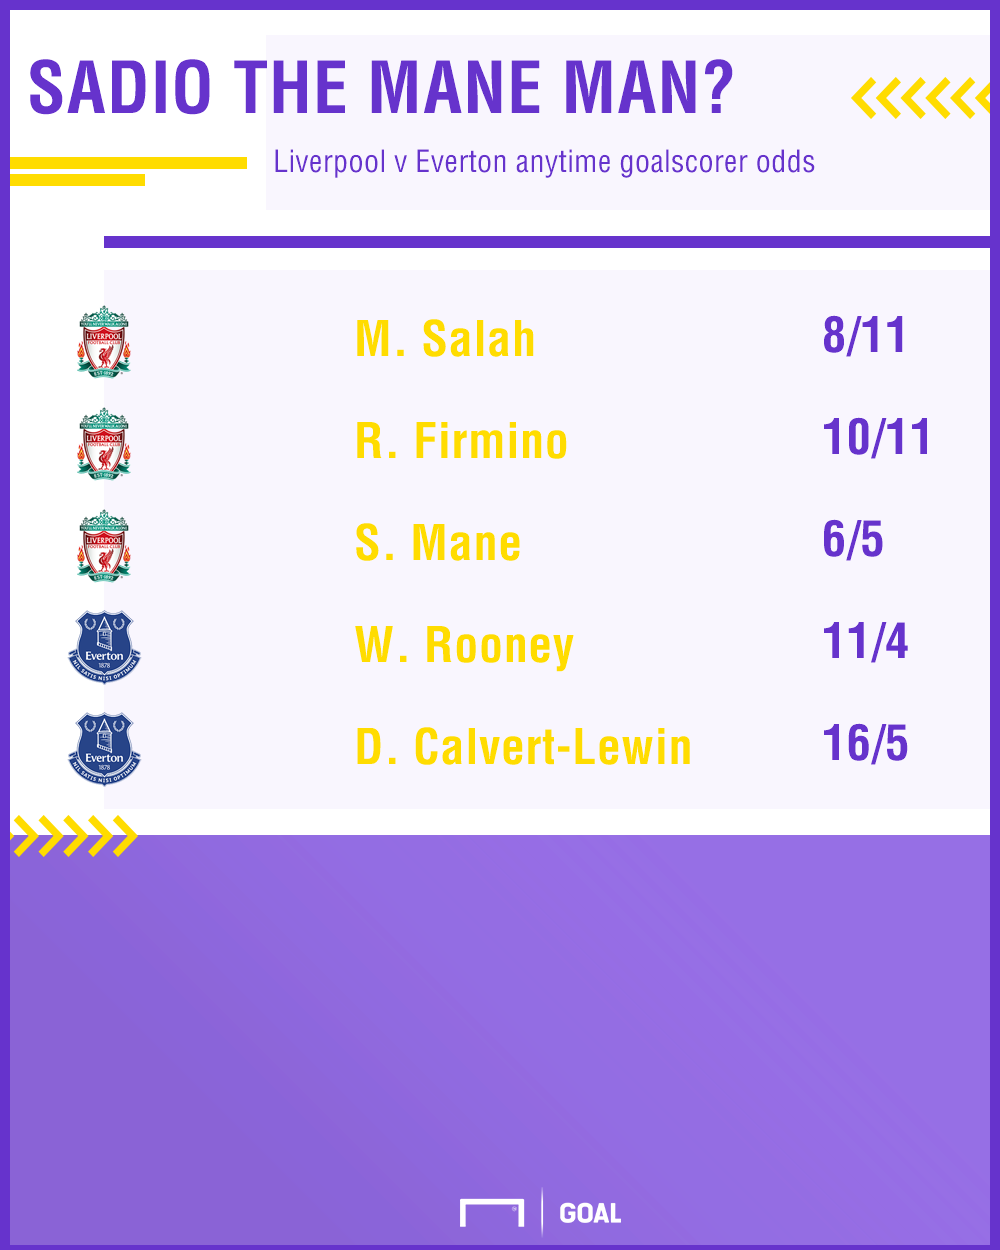 Liverpool Everton graphic